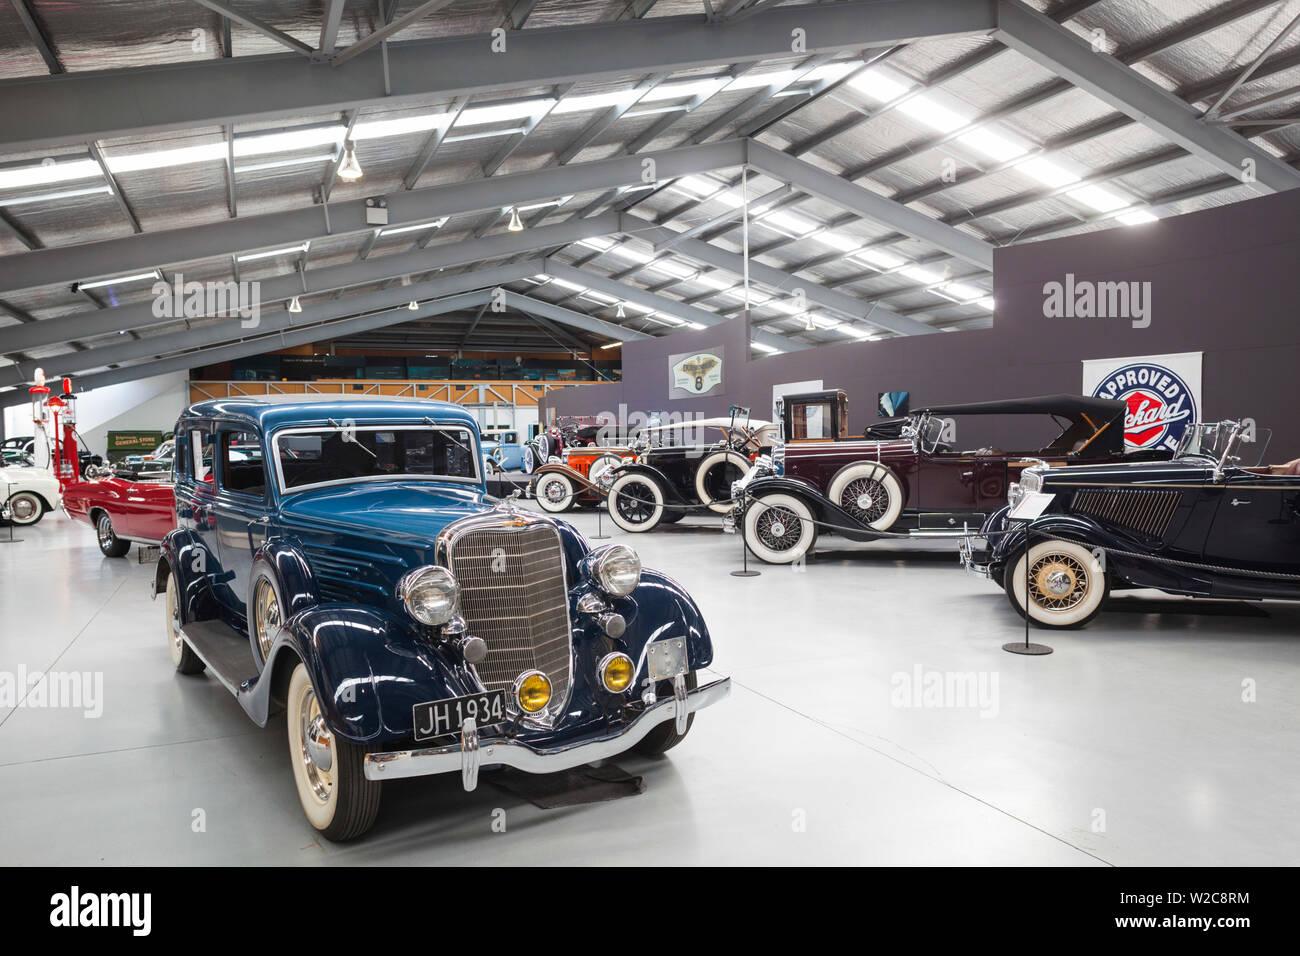 Neuseeland, Südinsel, Otago, Wanaka, Warbirds und Räder Museum, antike Autos Stockfoto